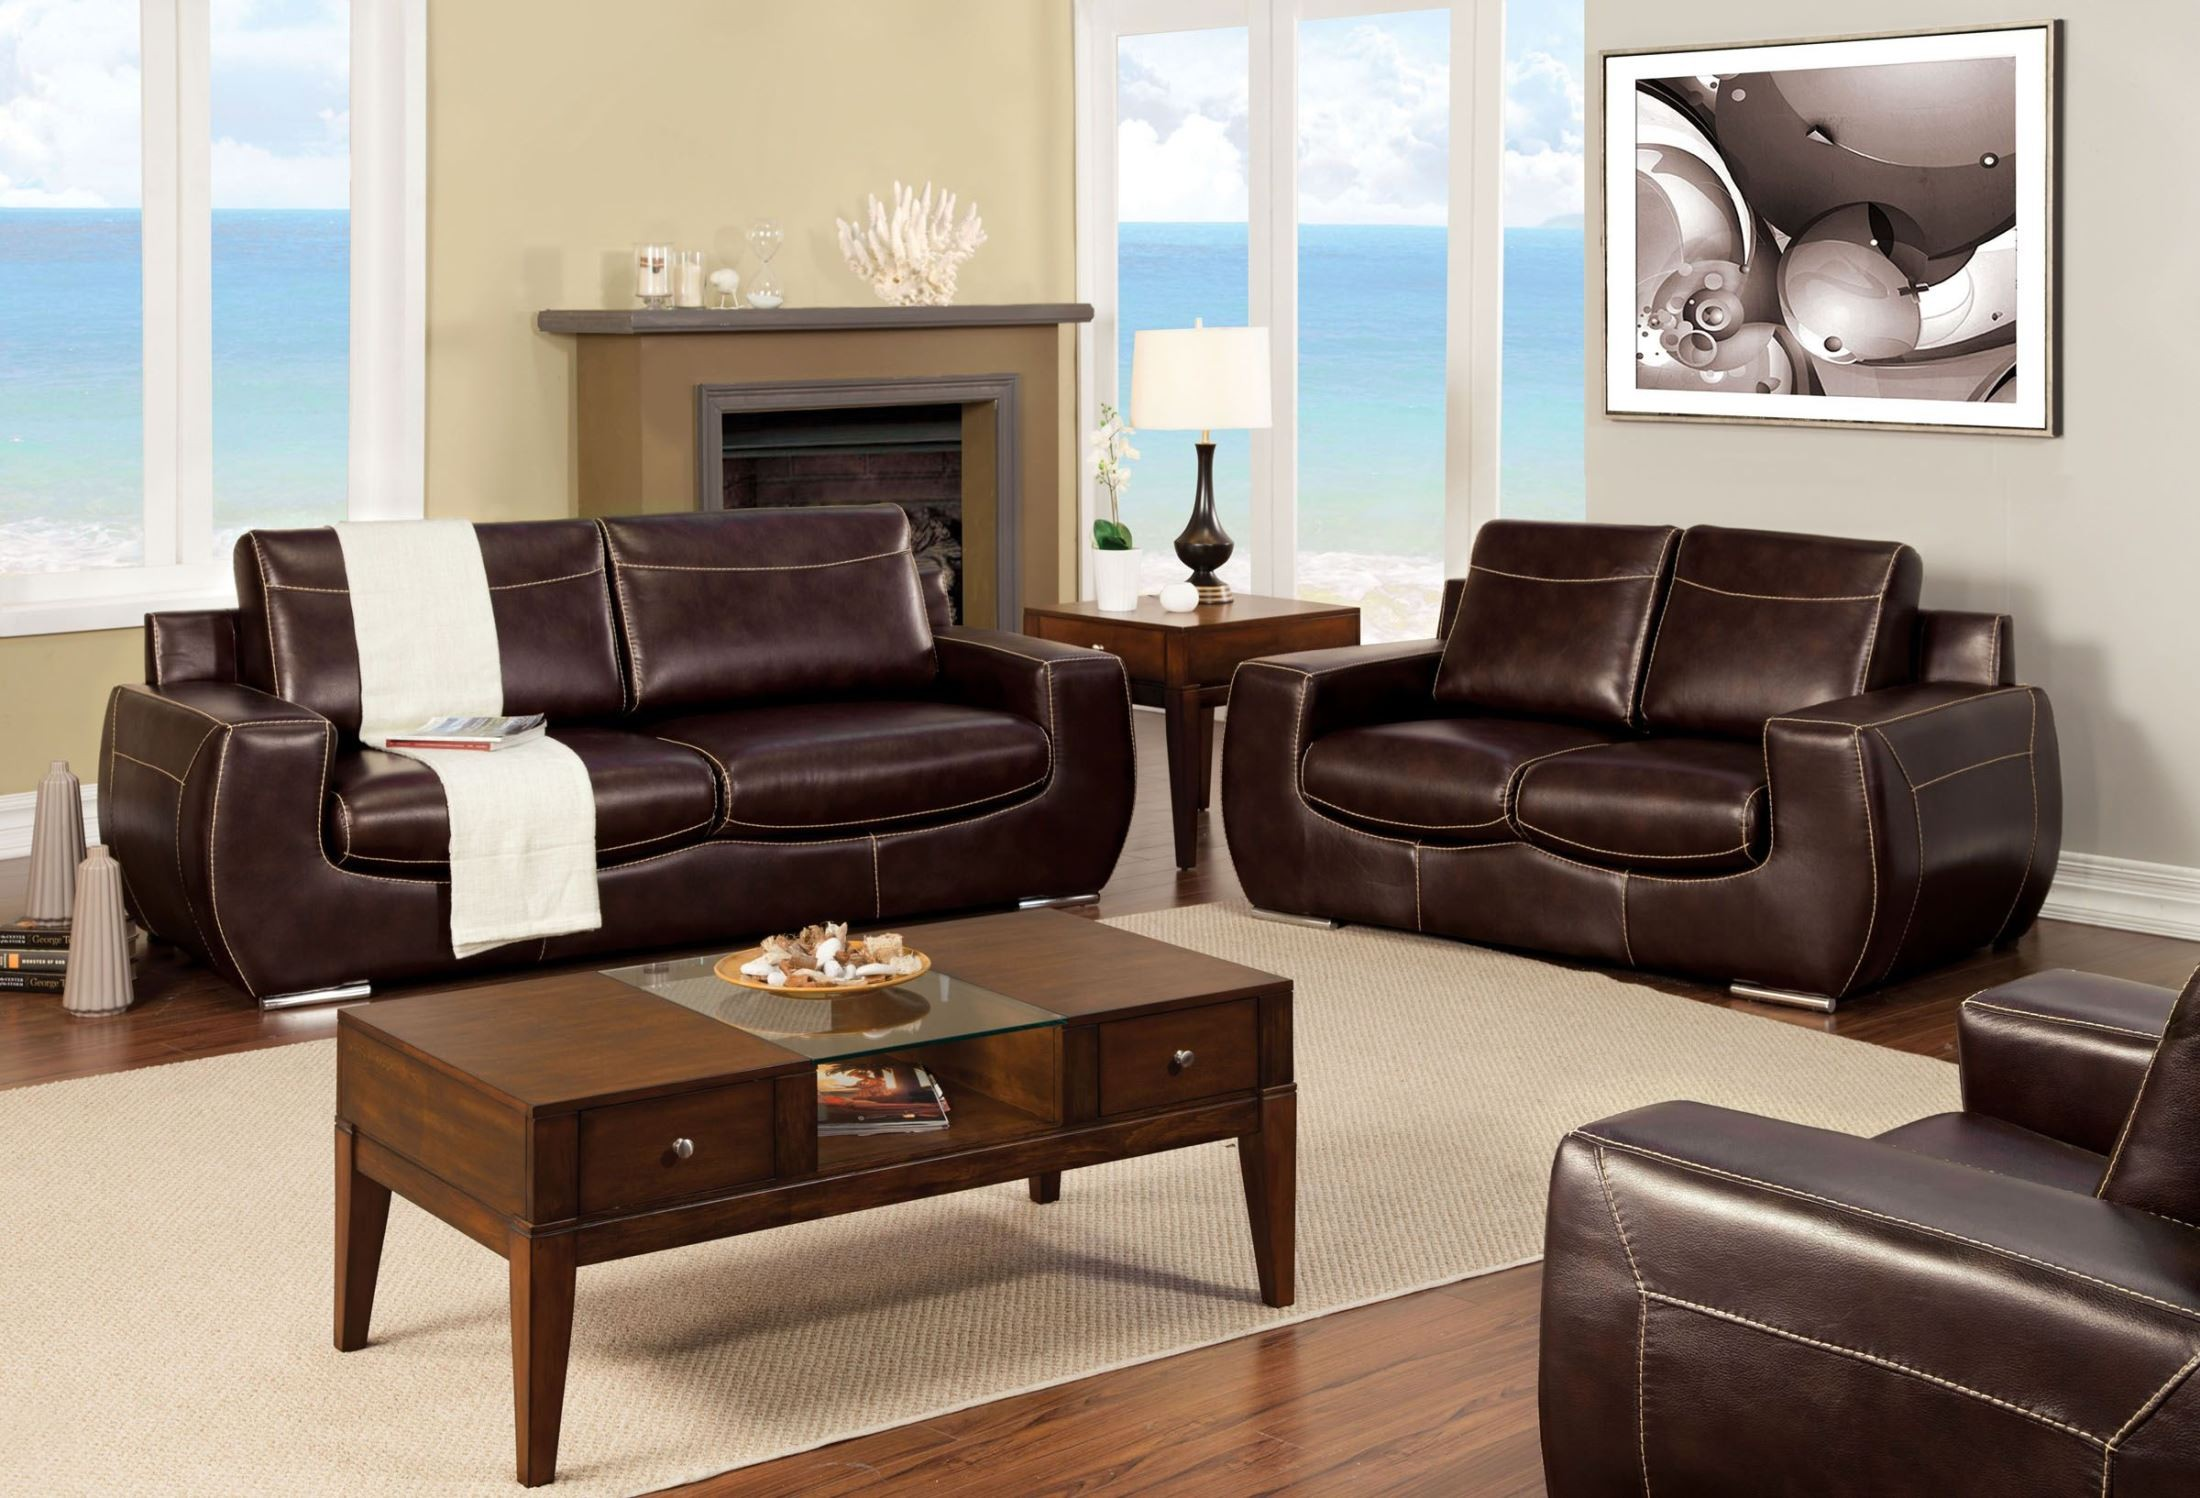 tekir espresso living room set from furniture of america sm6031 sf coleman furniture